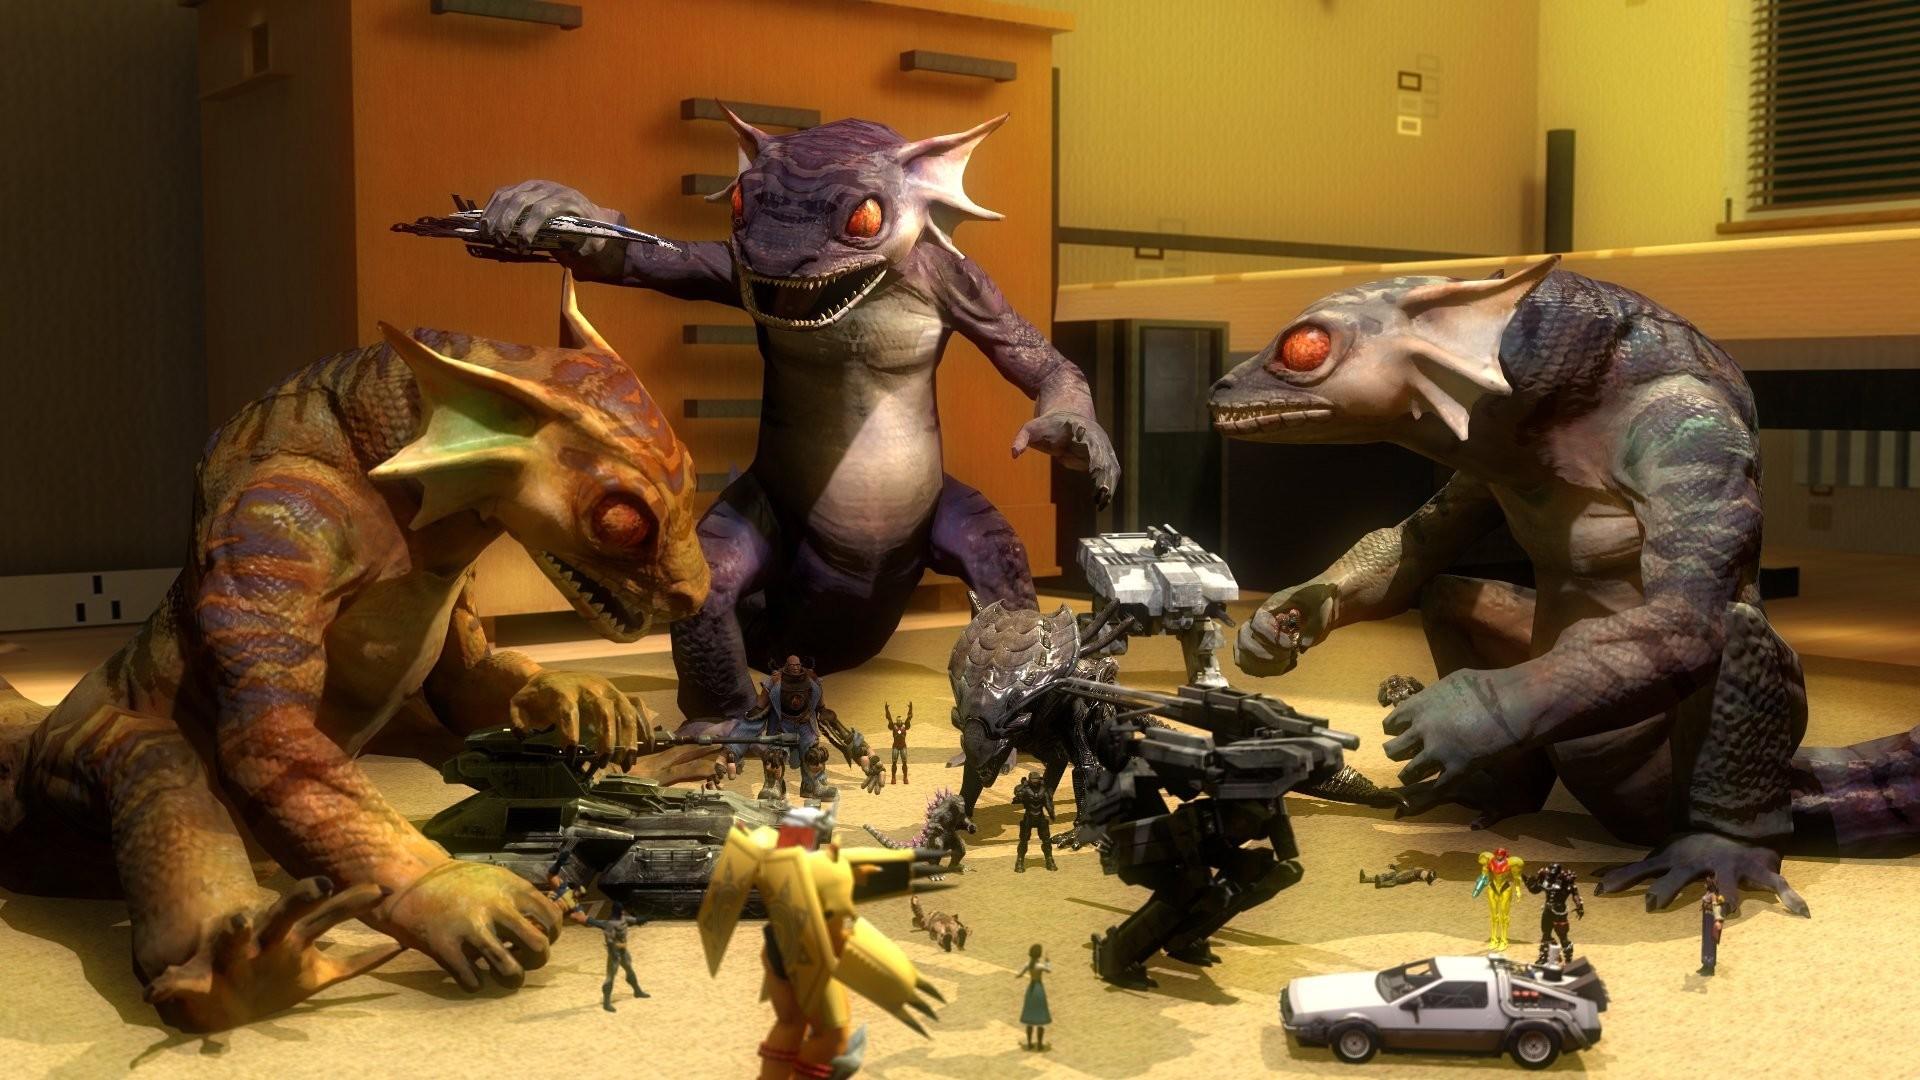 gecko art toys lizard crossover fallout: new vegas